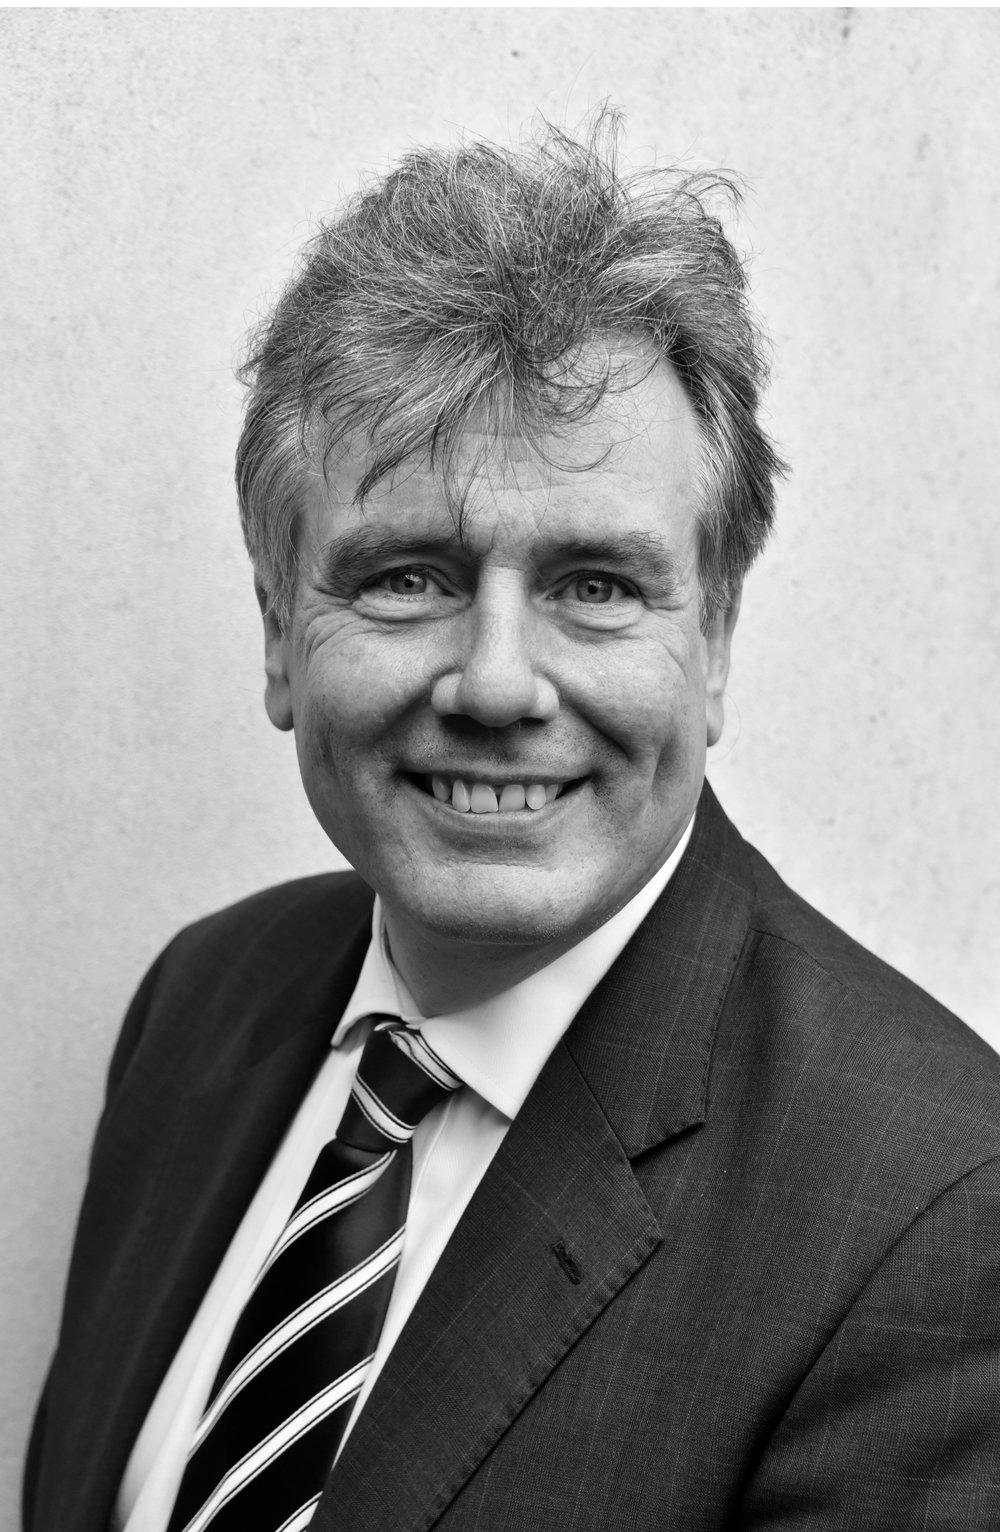 Neil Carmichael  Senior Adviser, Education and International